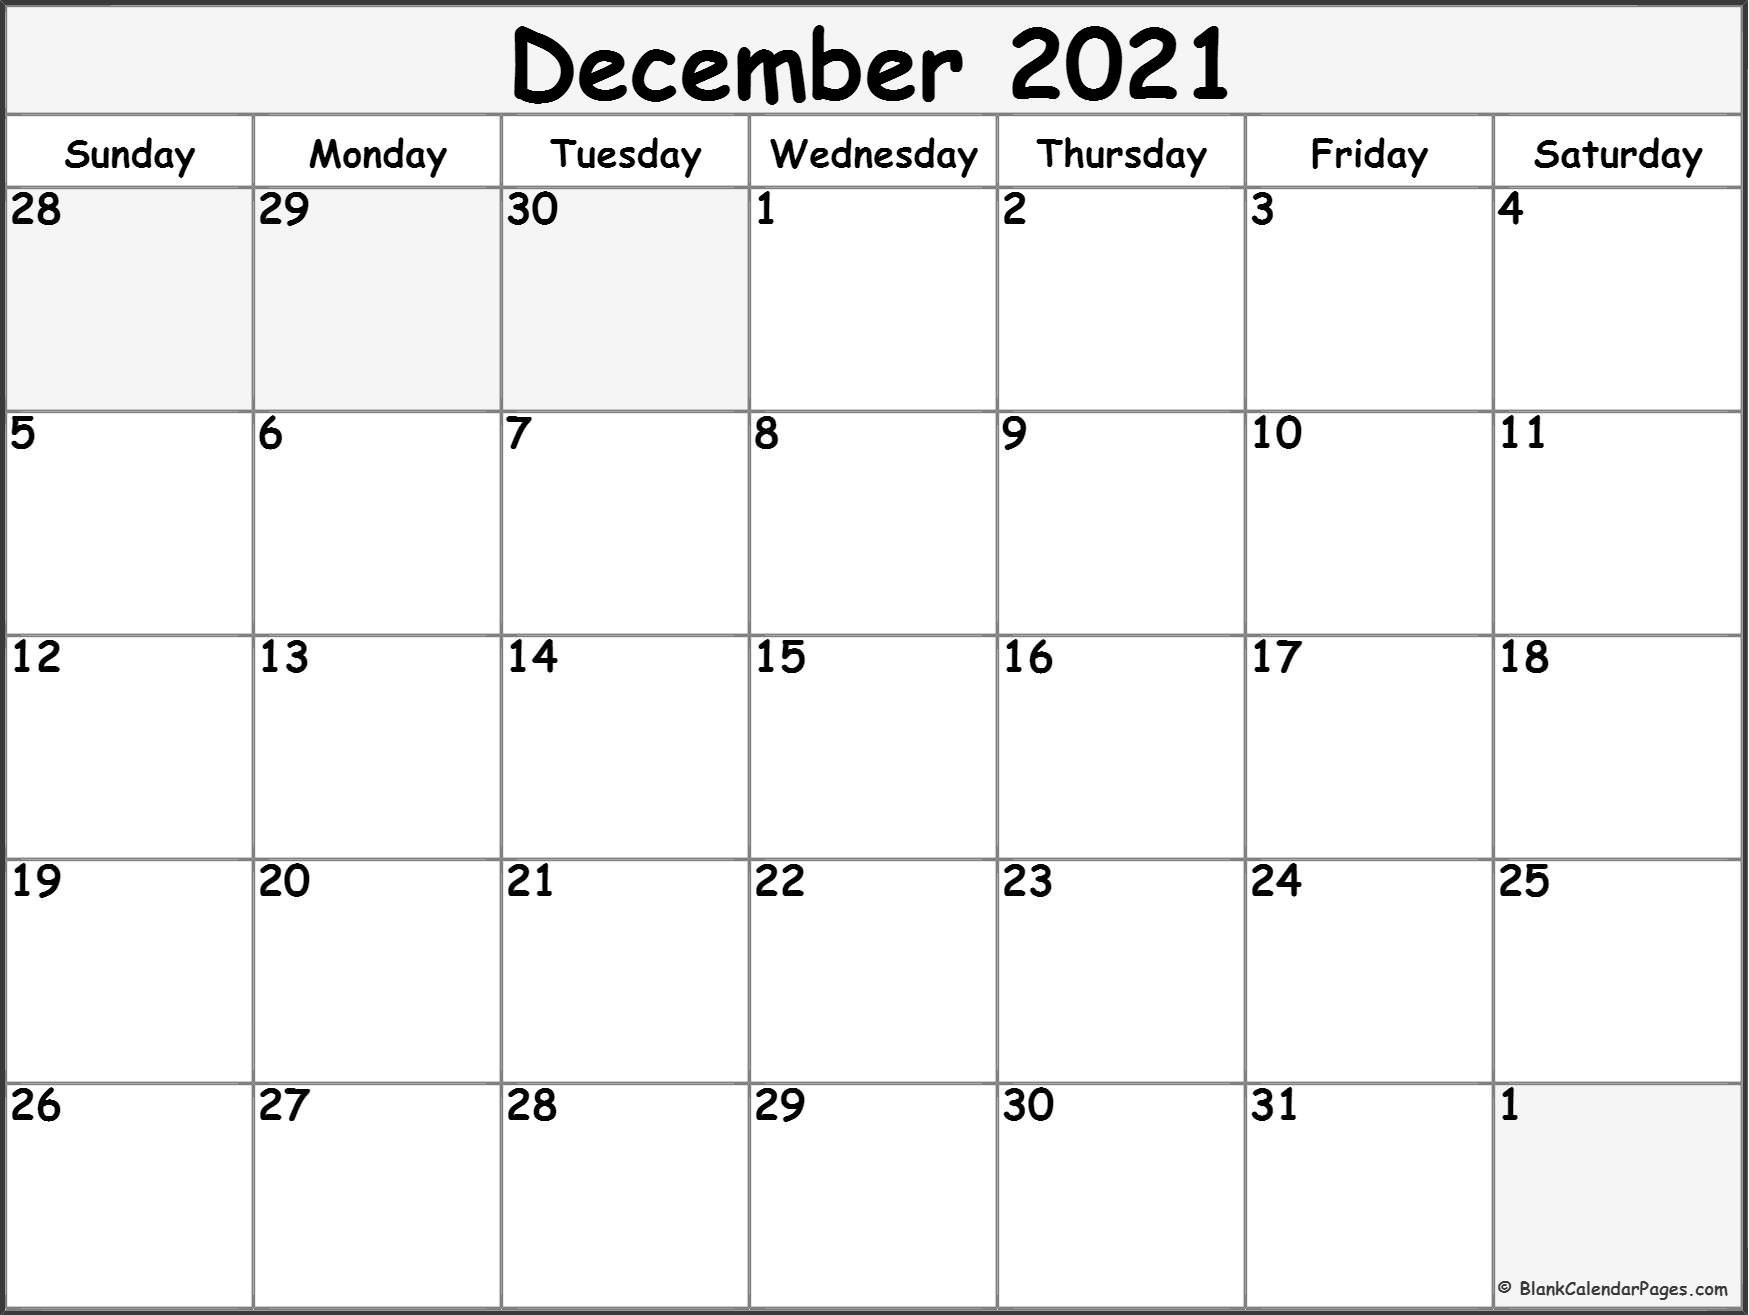 December 2021 Calendar | Free Printable Calendar in 2021 Free Printable Weekly Calendar Blank Image